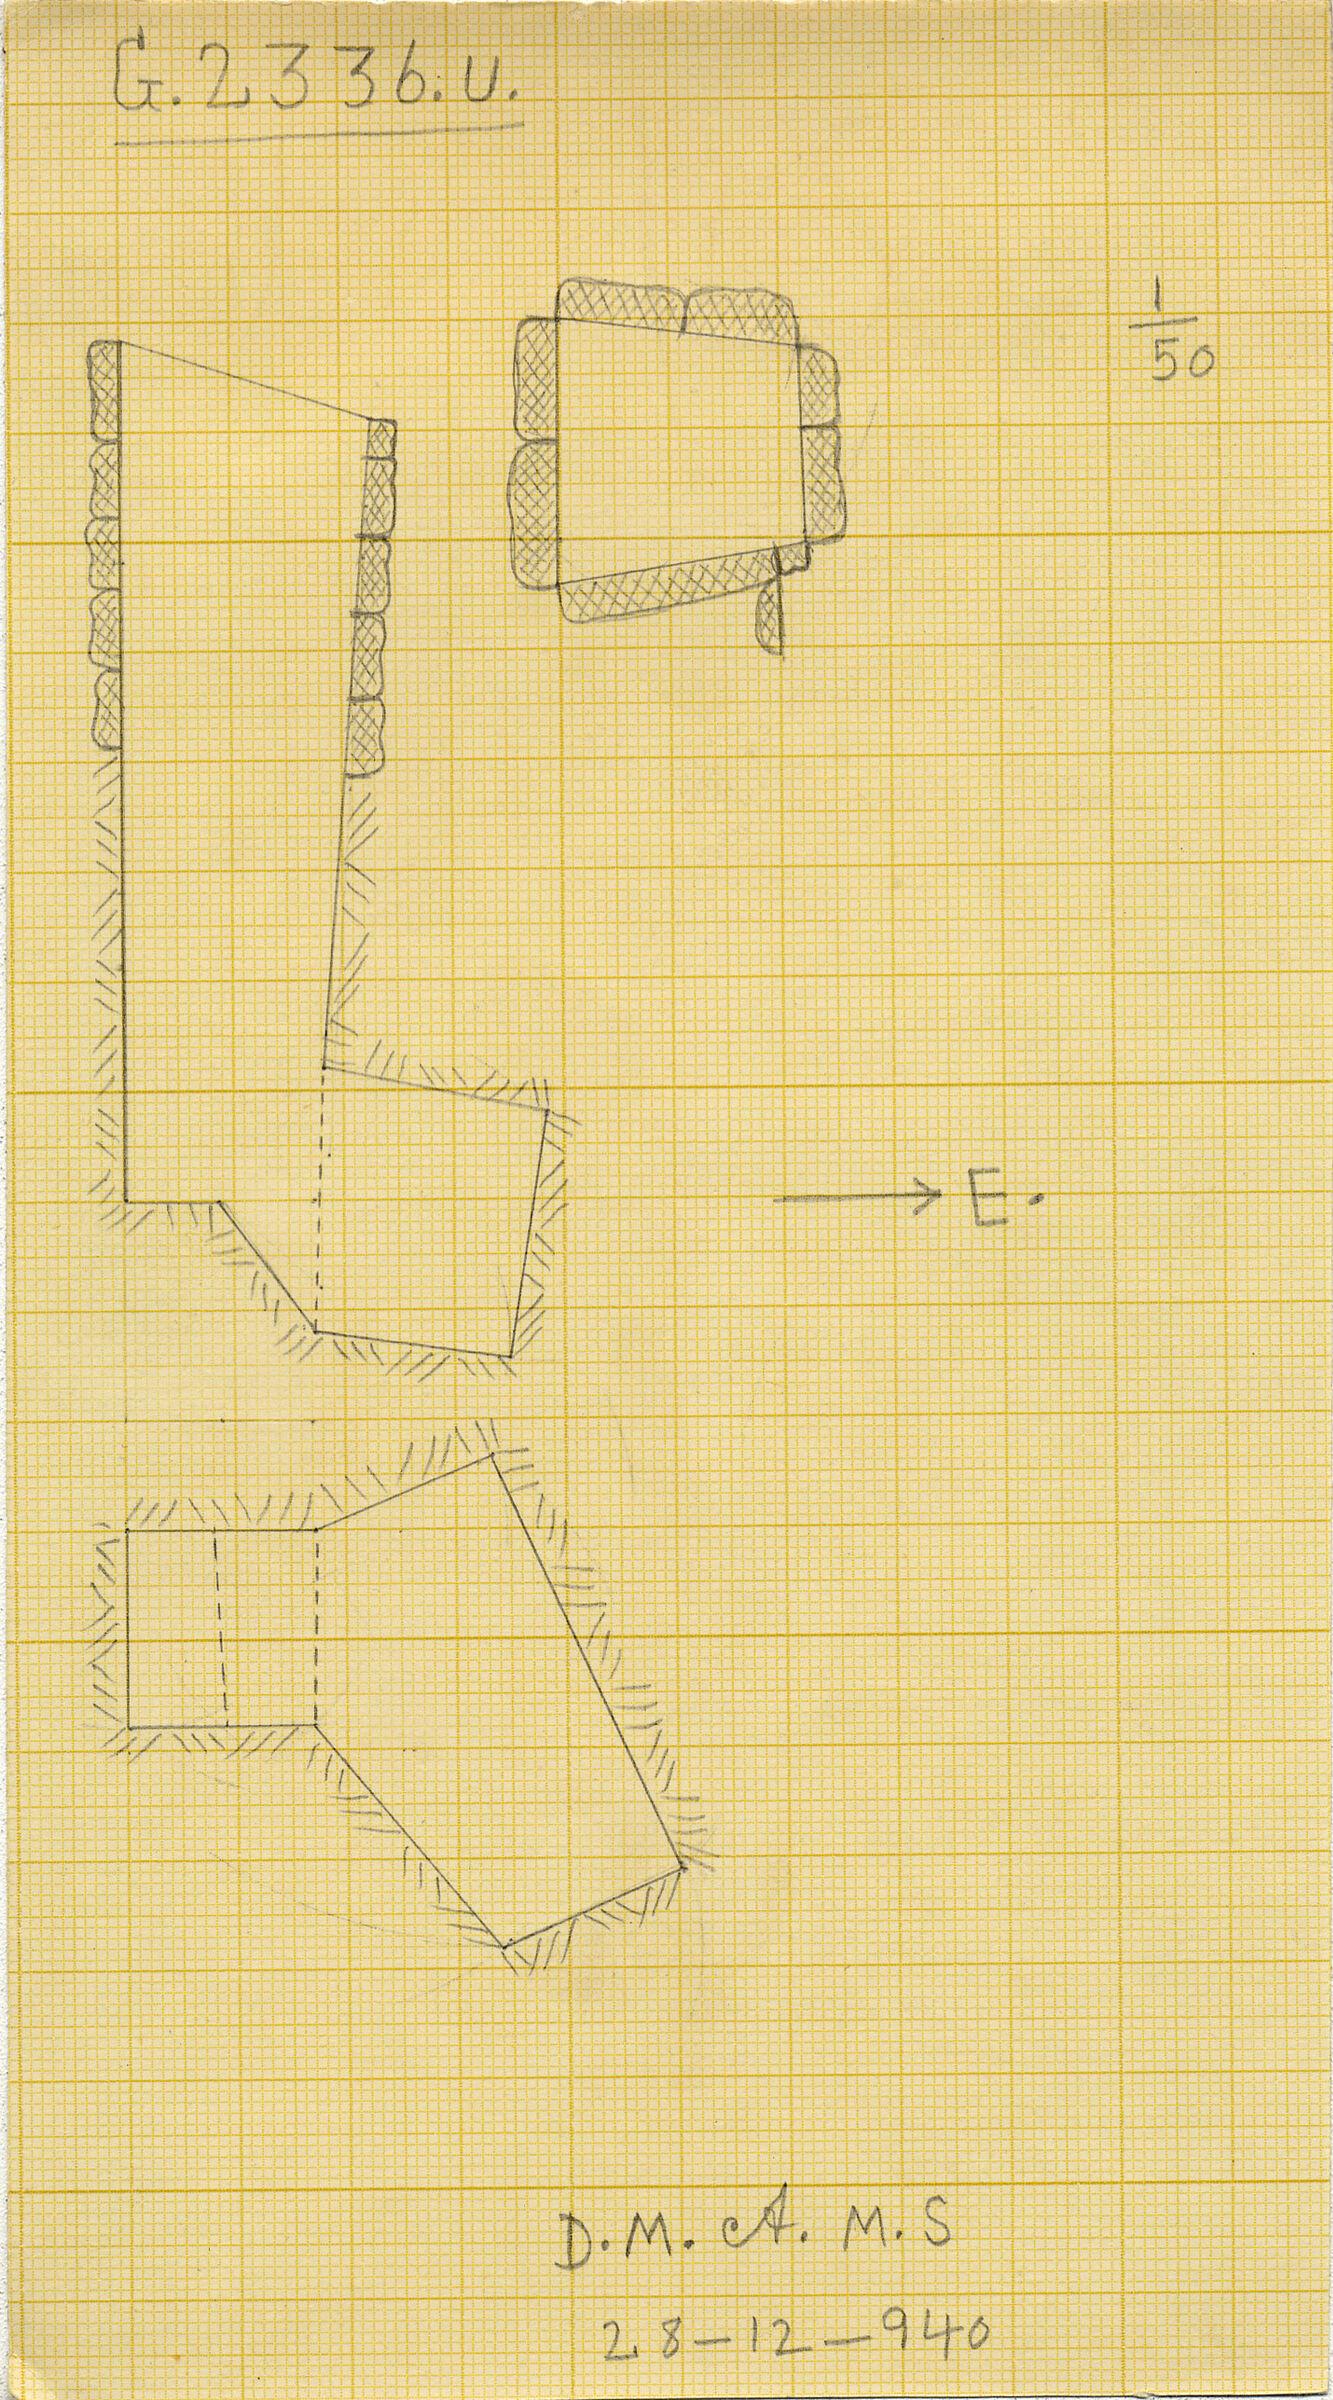 Maps and plans: G 2336, Shaft U